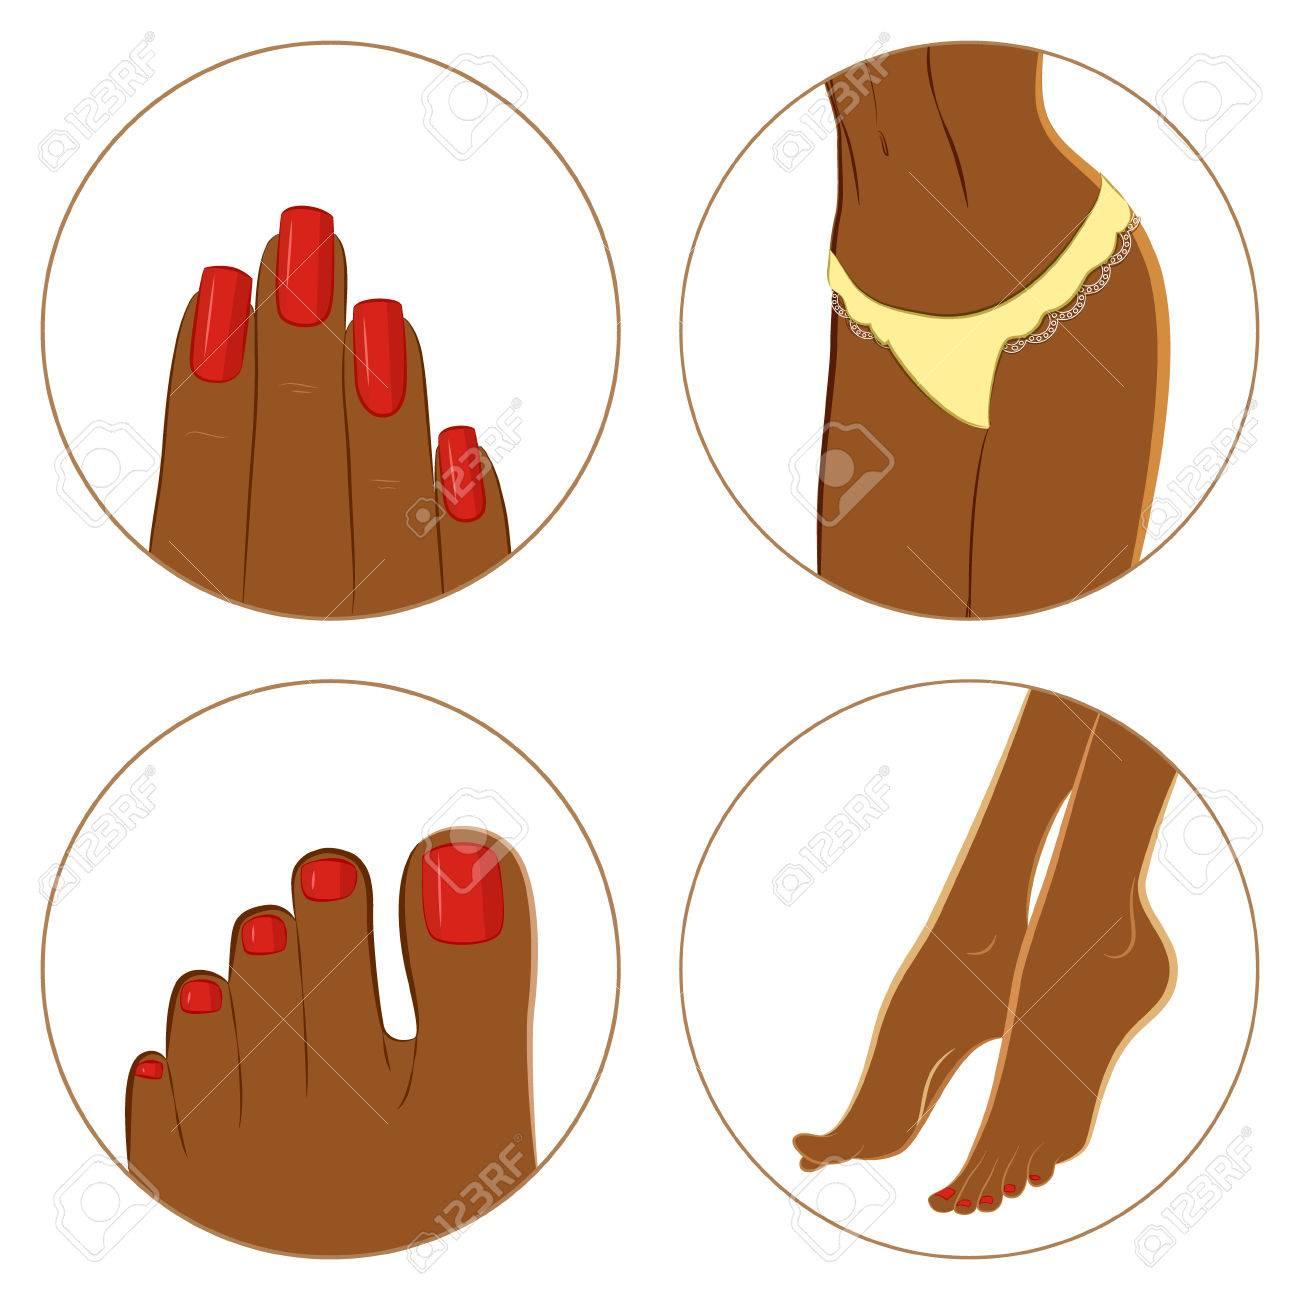 bodycare and manicure